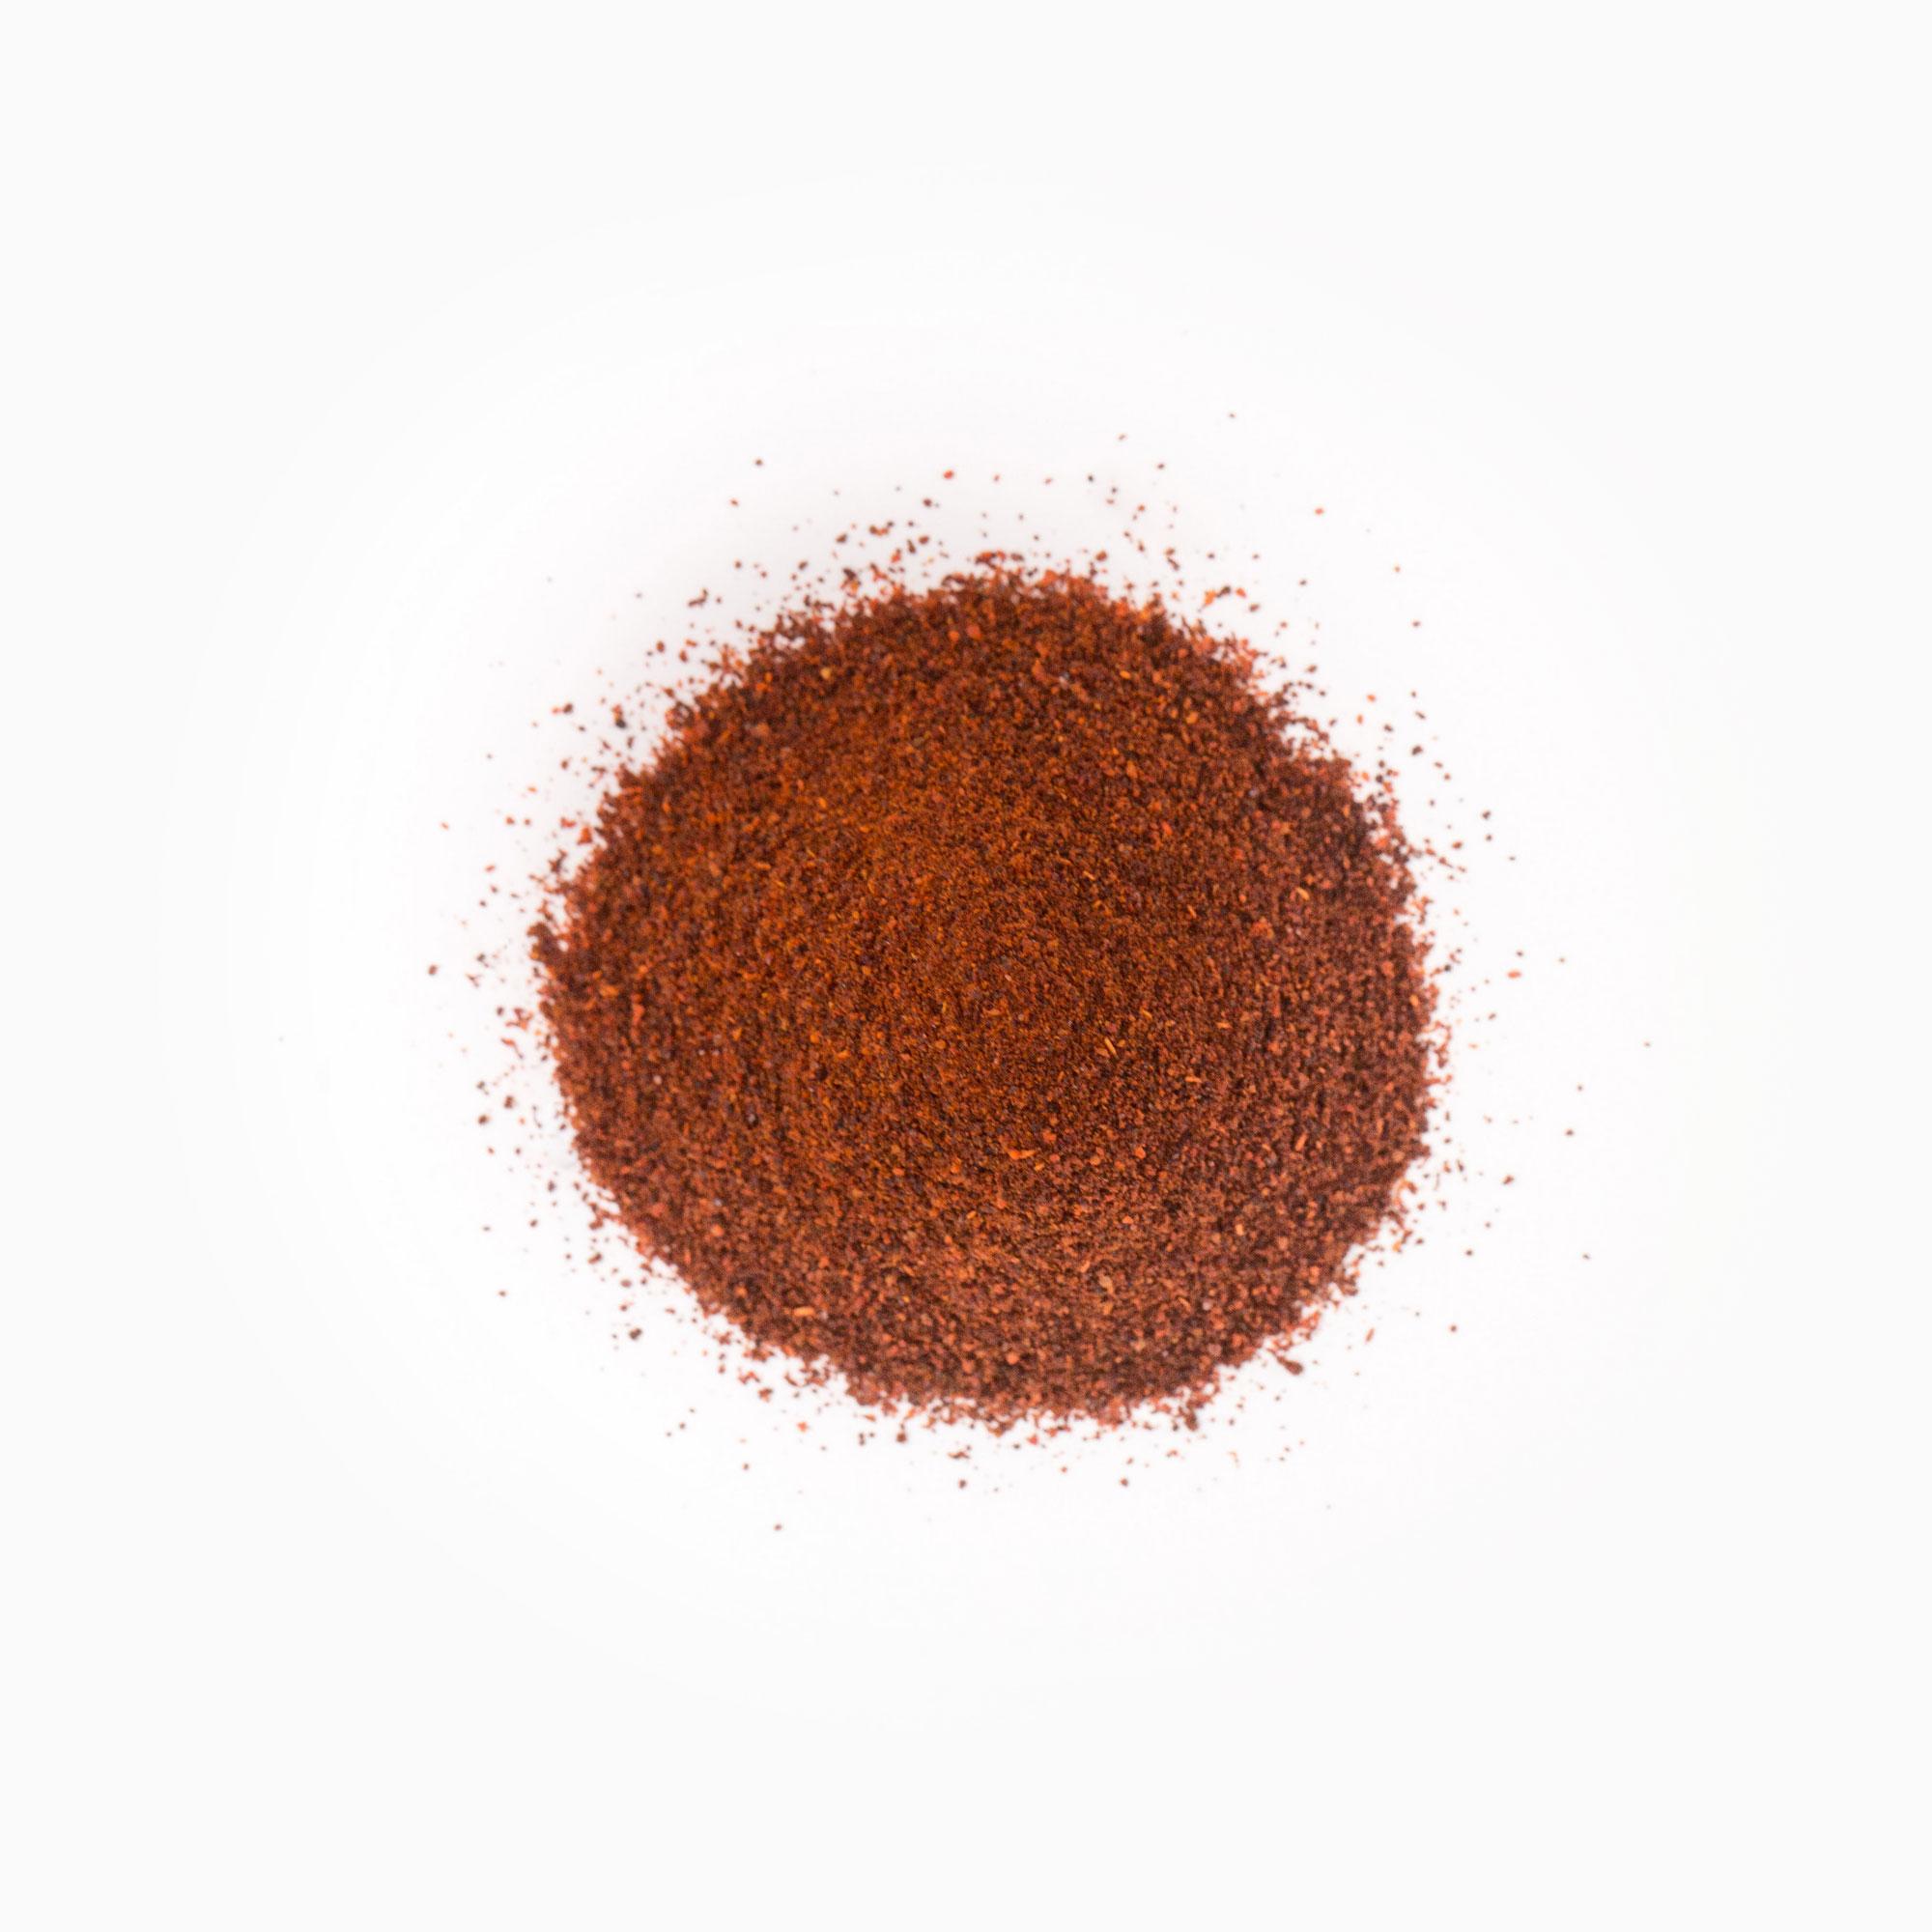 redpowder.jpg